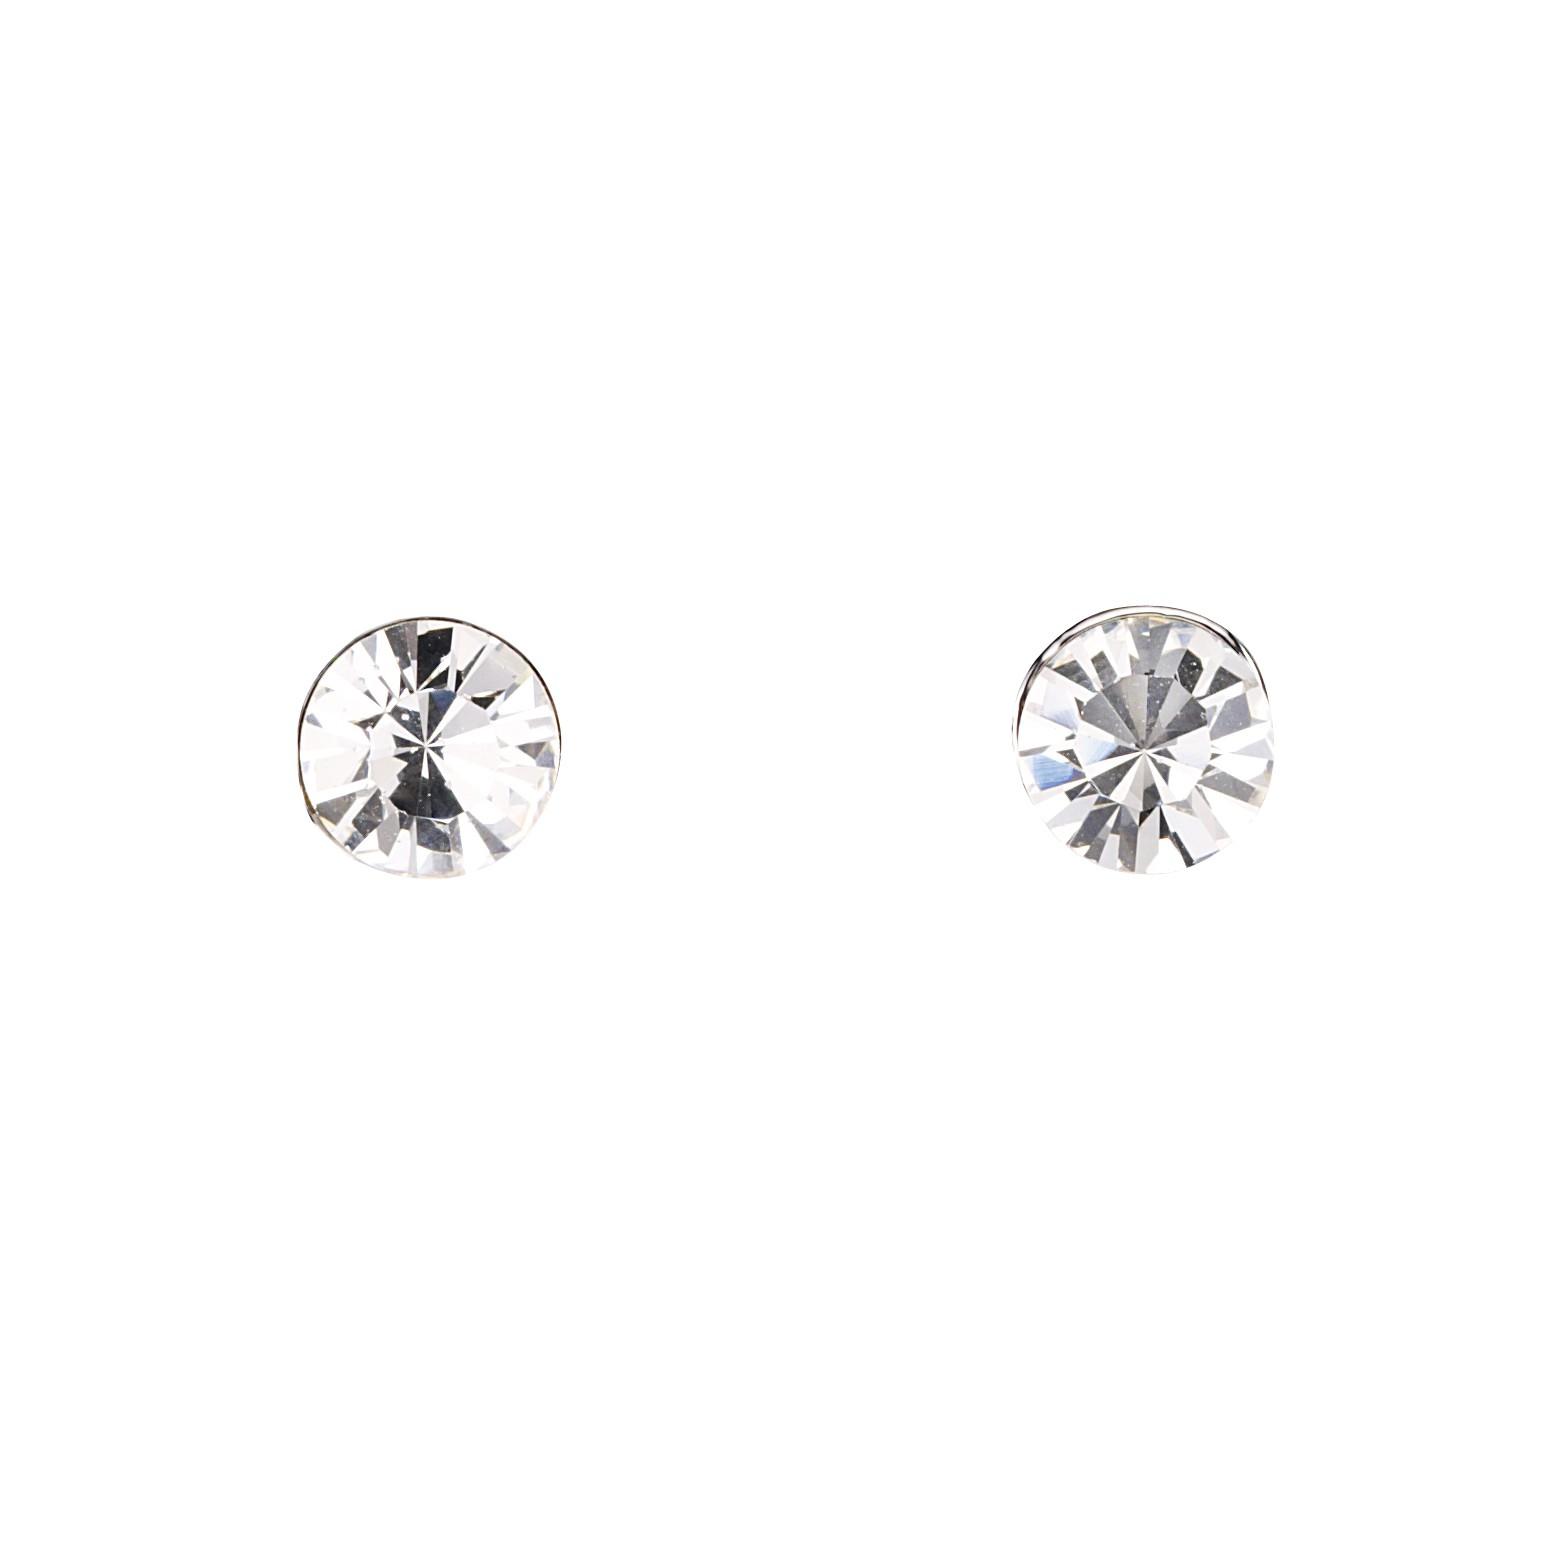 Earrings Stud Diamond Square Ear